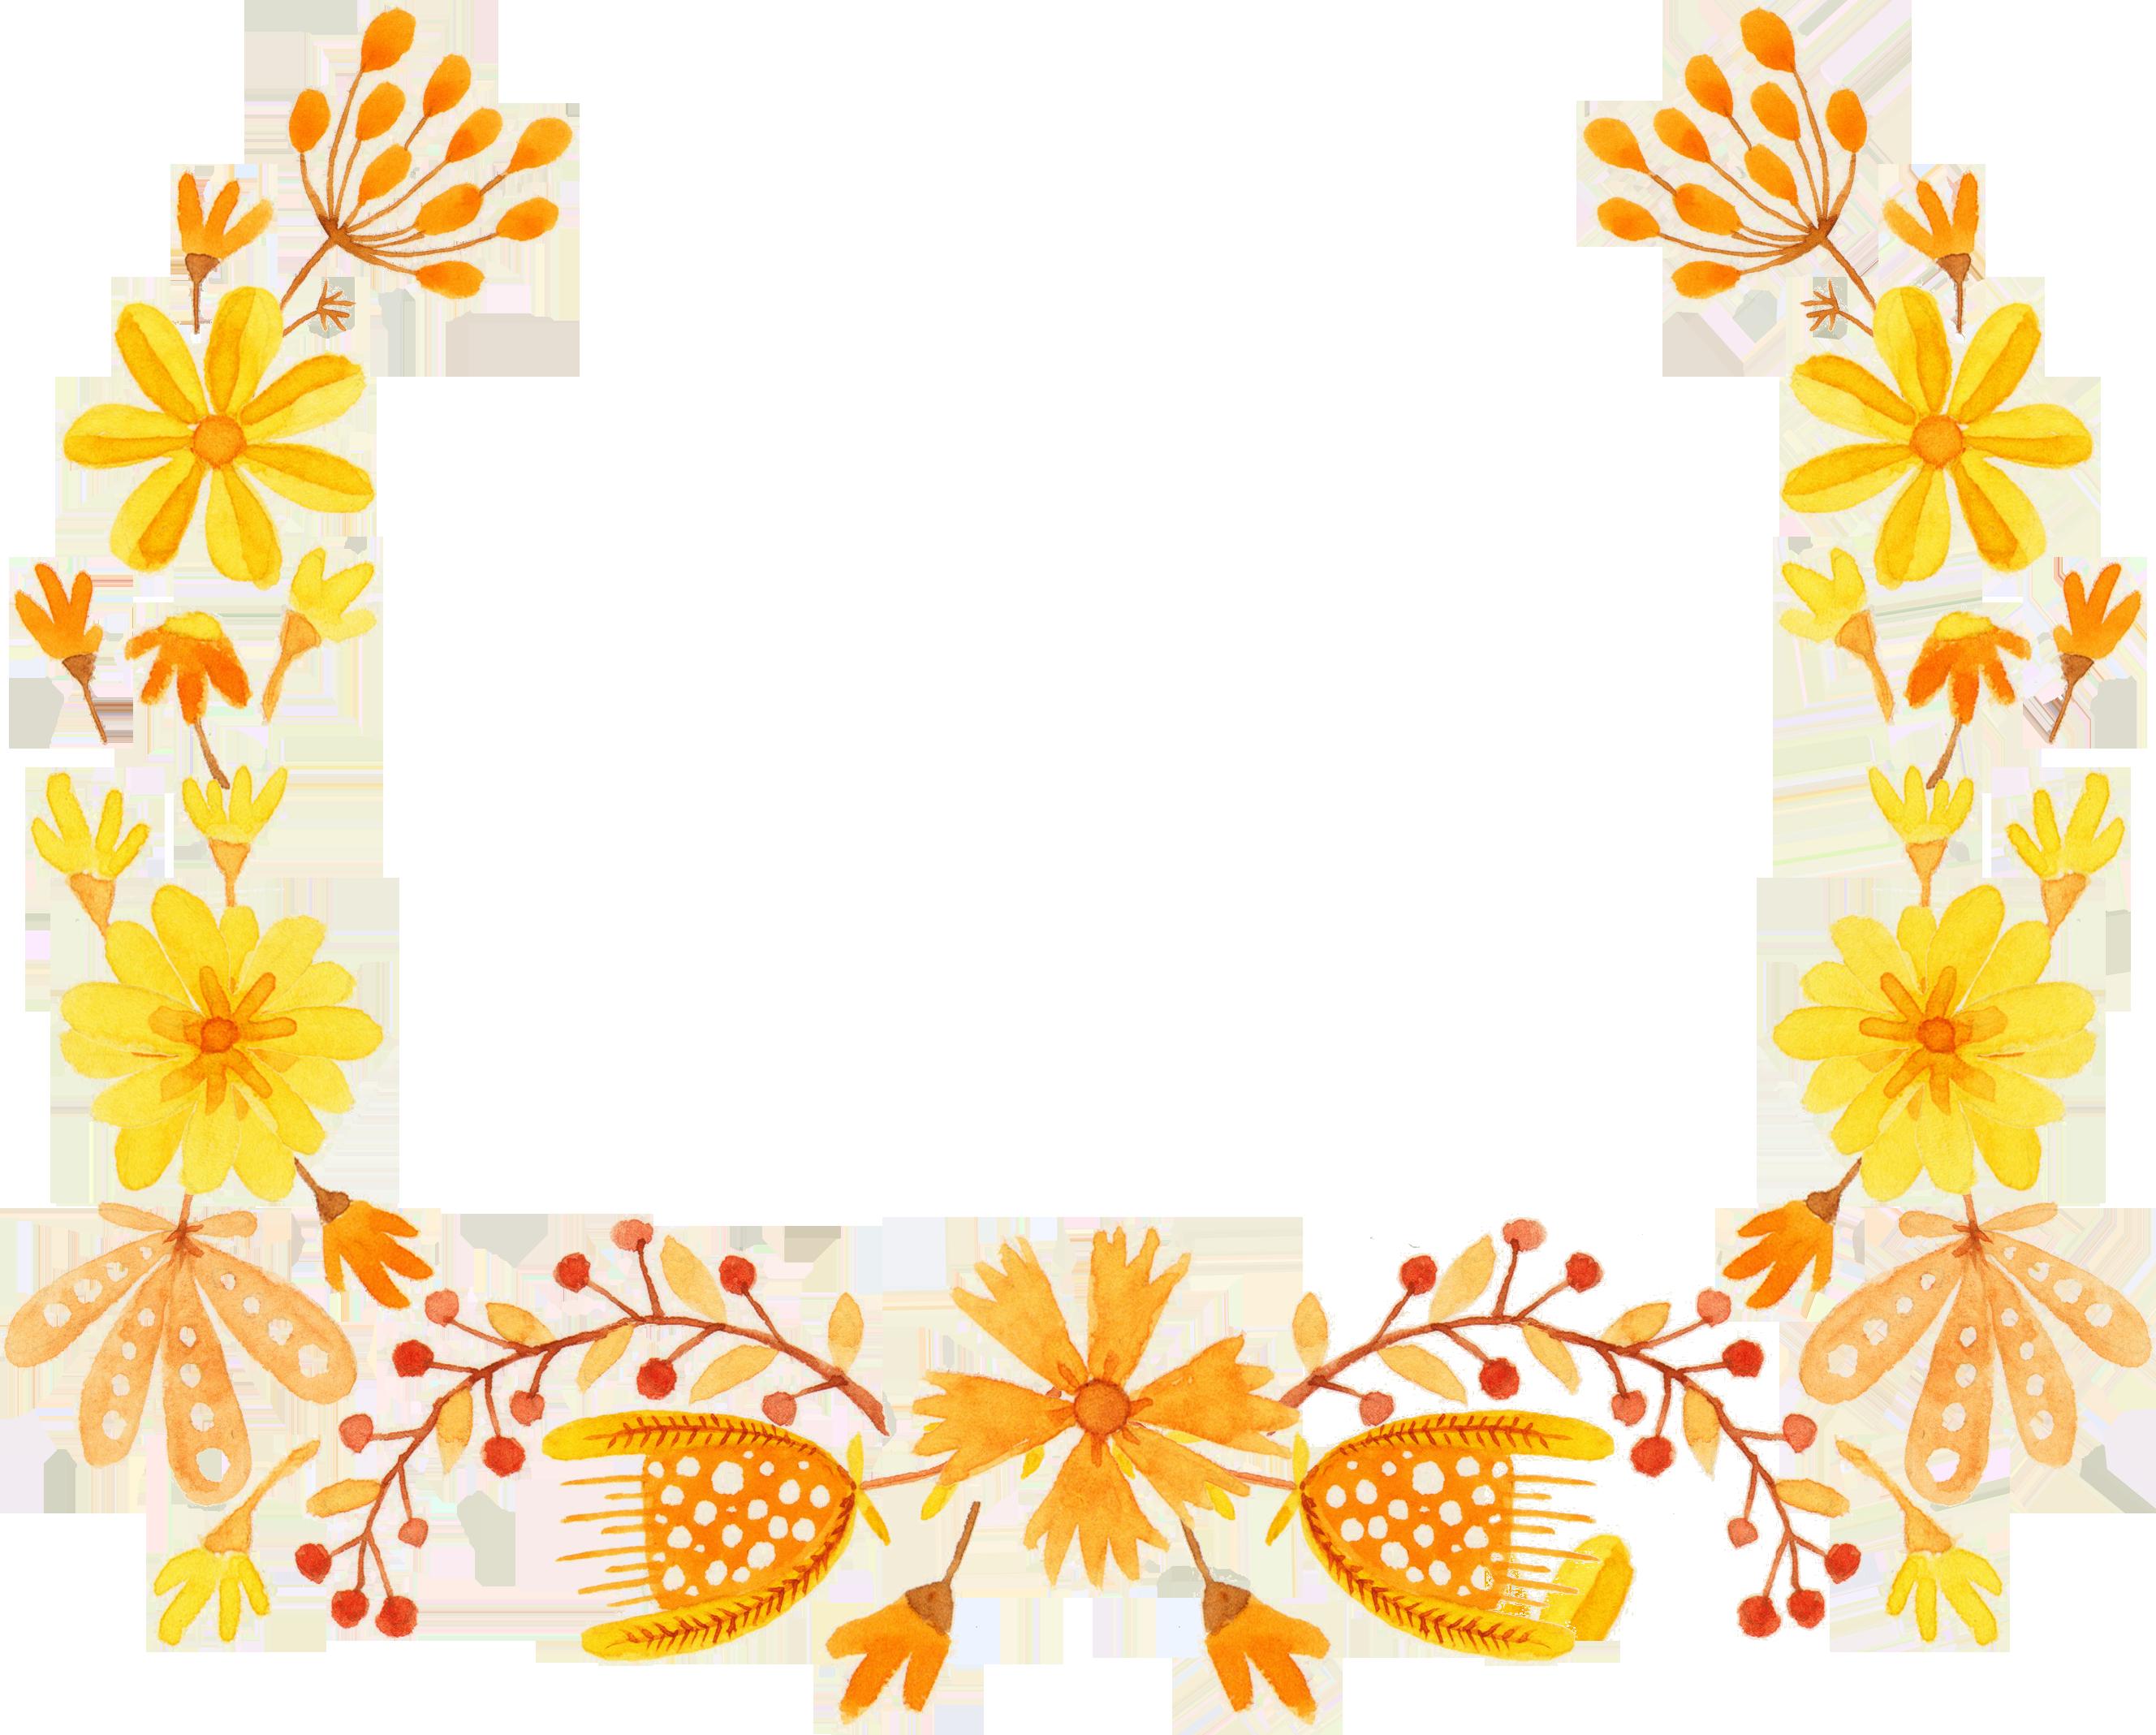 Orange flower border clipart black and white download Yellow Flower Semicircle Clip art - Semi-round yellow floral border ... black and white download